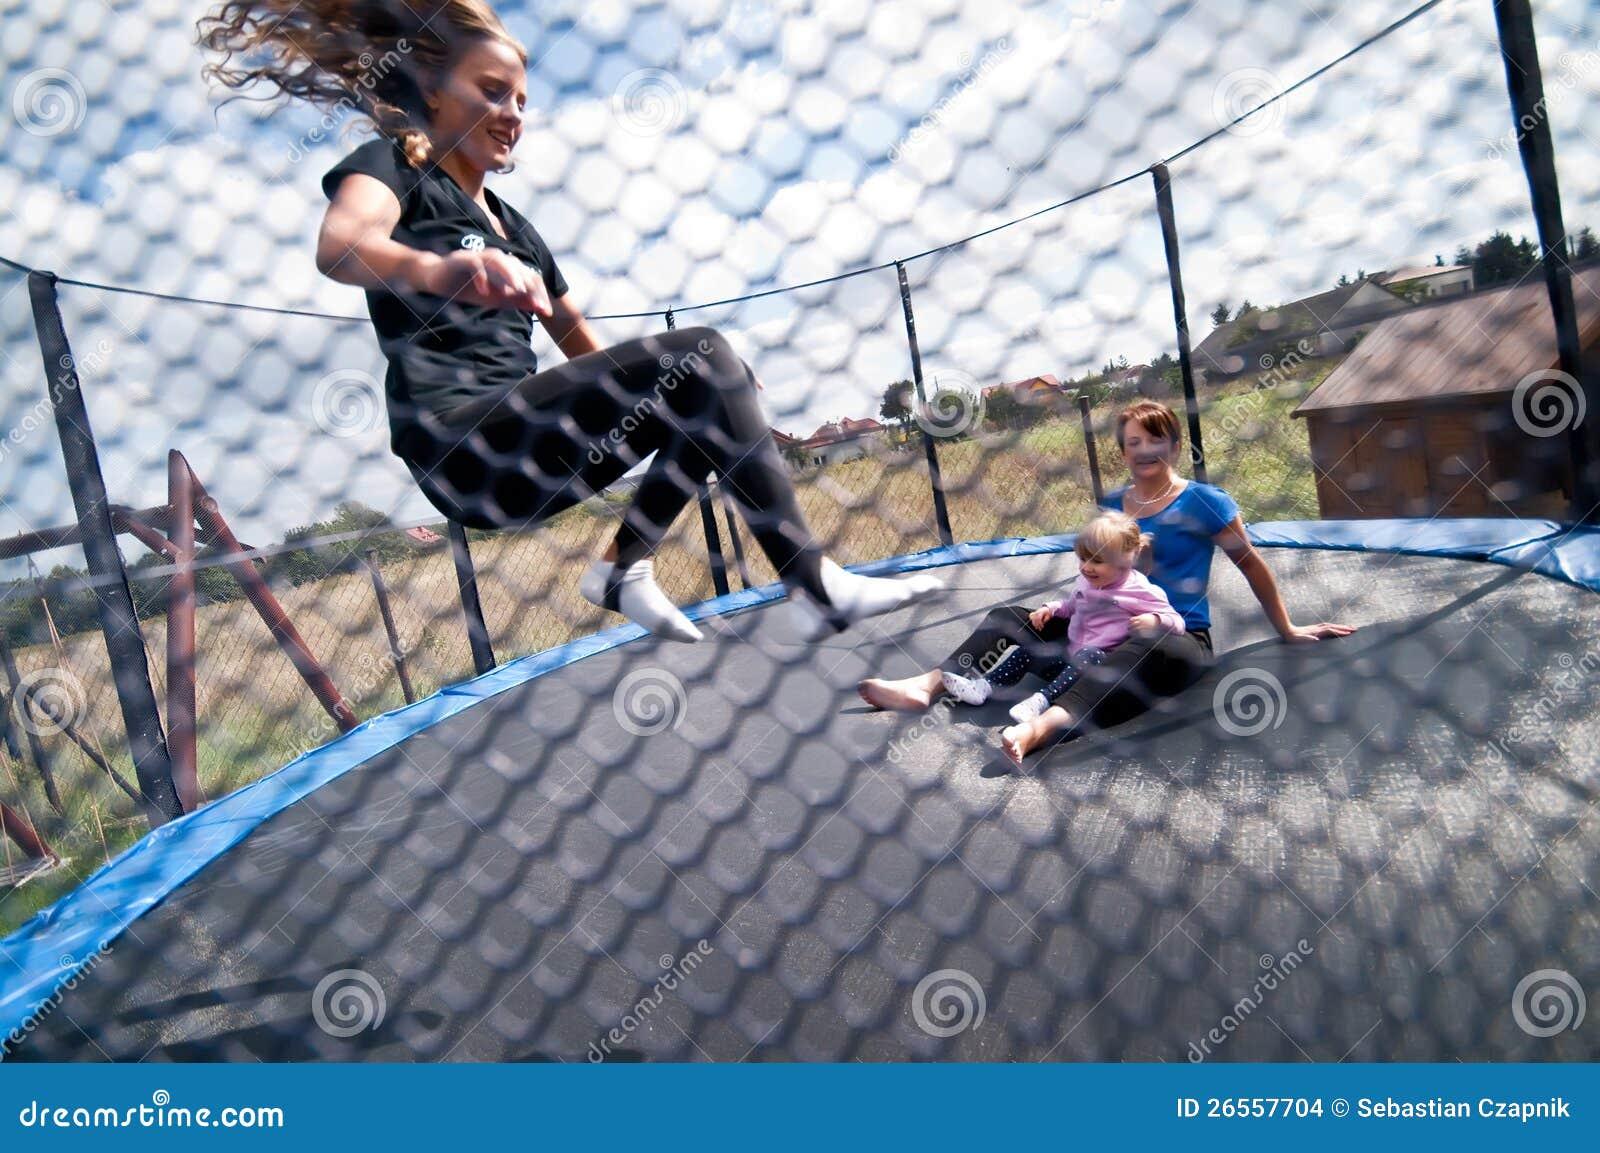 image gallery trampoline fun. Black Bedroom Furniture Sets. Home Design Ideas